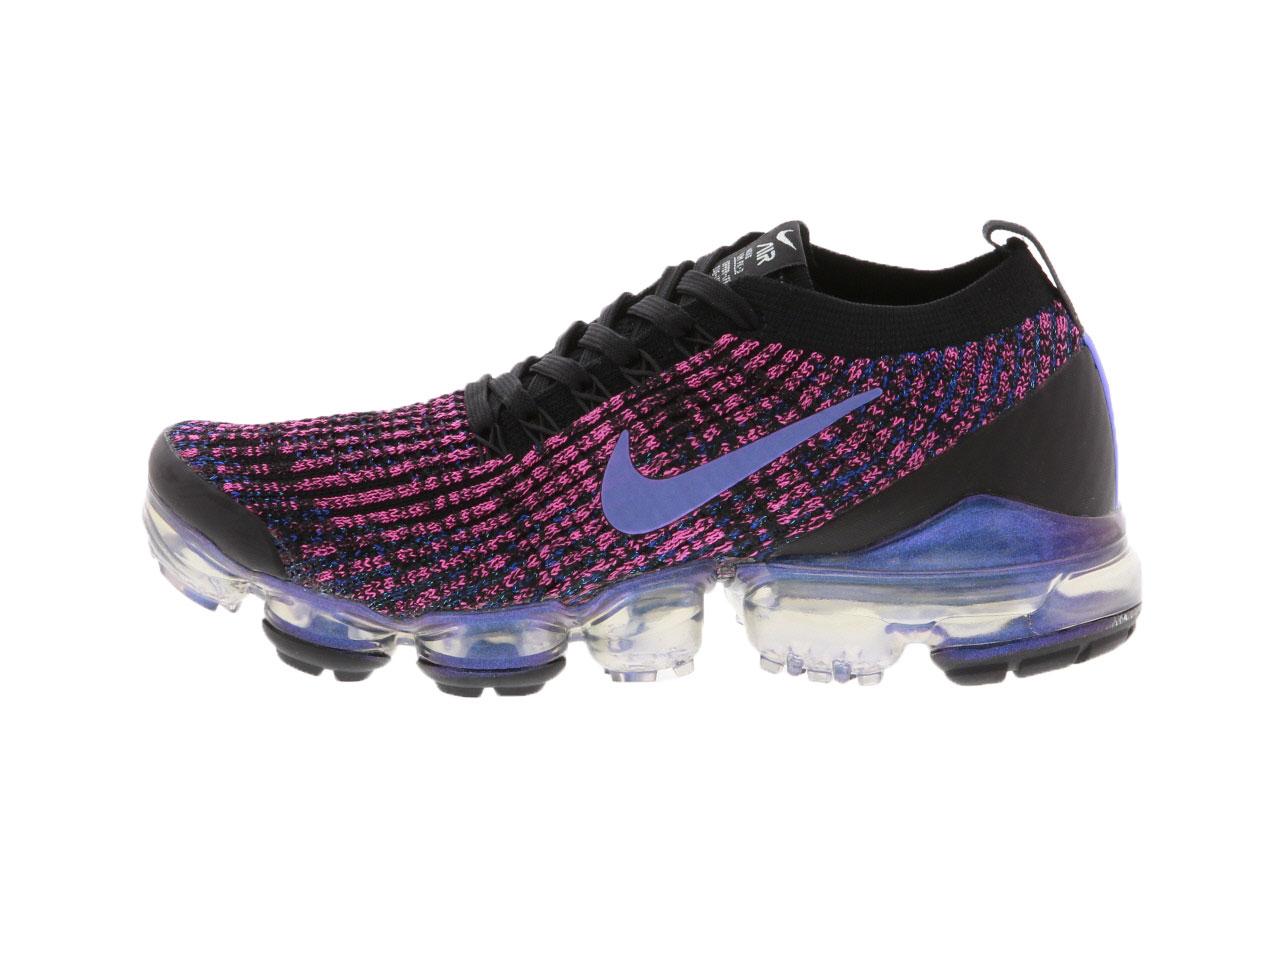 【OUTLET特価】NIKE WMNS AIR VAPORMAX FLYKNIT 3(AJ6910-003)【ナイキ】【メンズファッション】【シューズ】【スニーカー】【靴】【フットウェア】